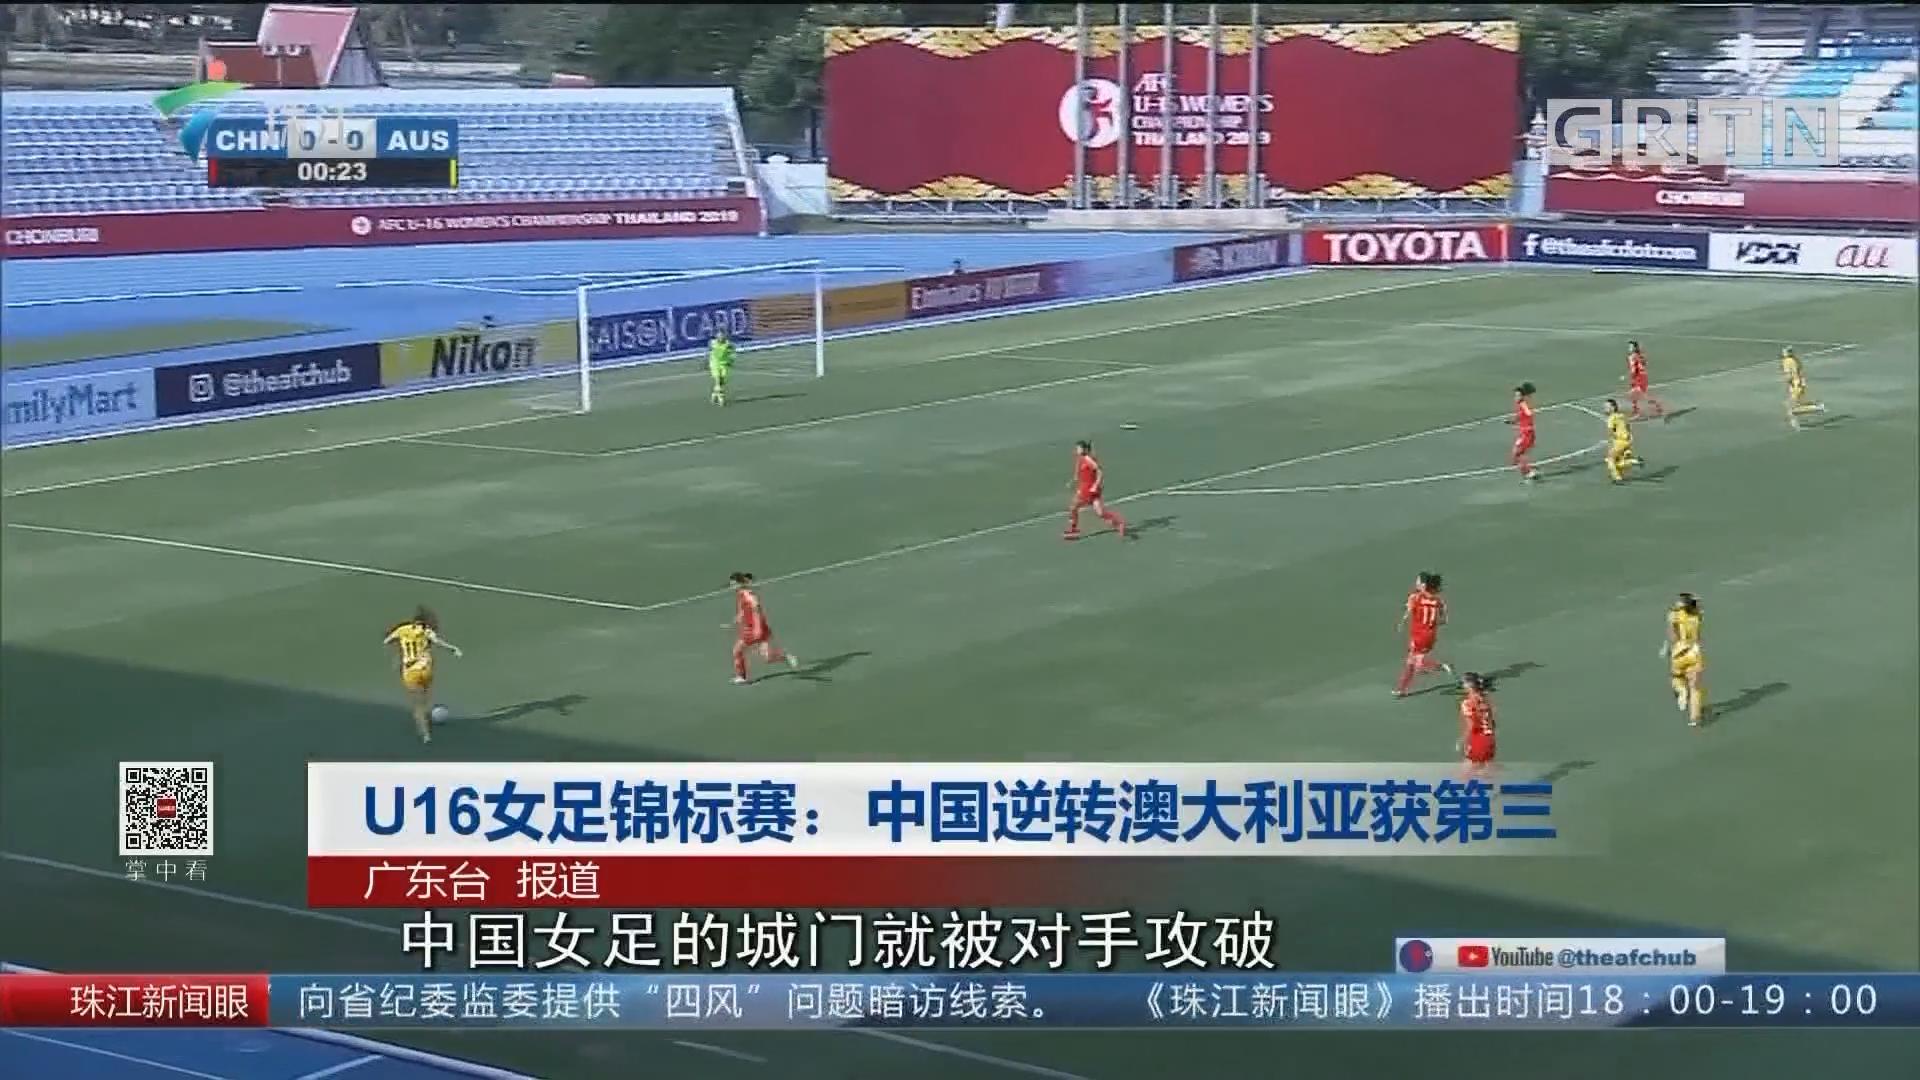 U16女足錦標賽:中國逆轉澳大利亞獲第三